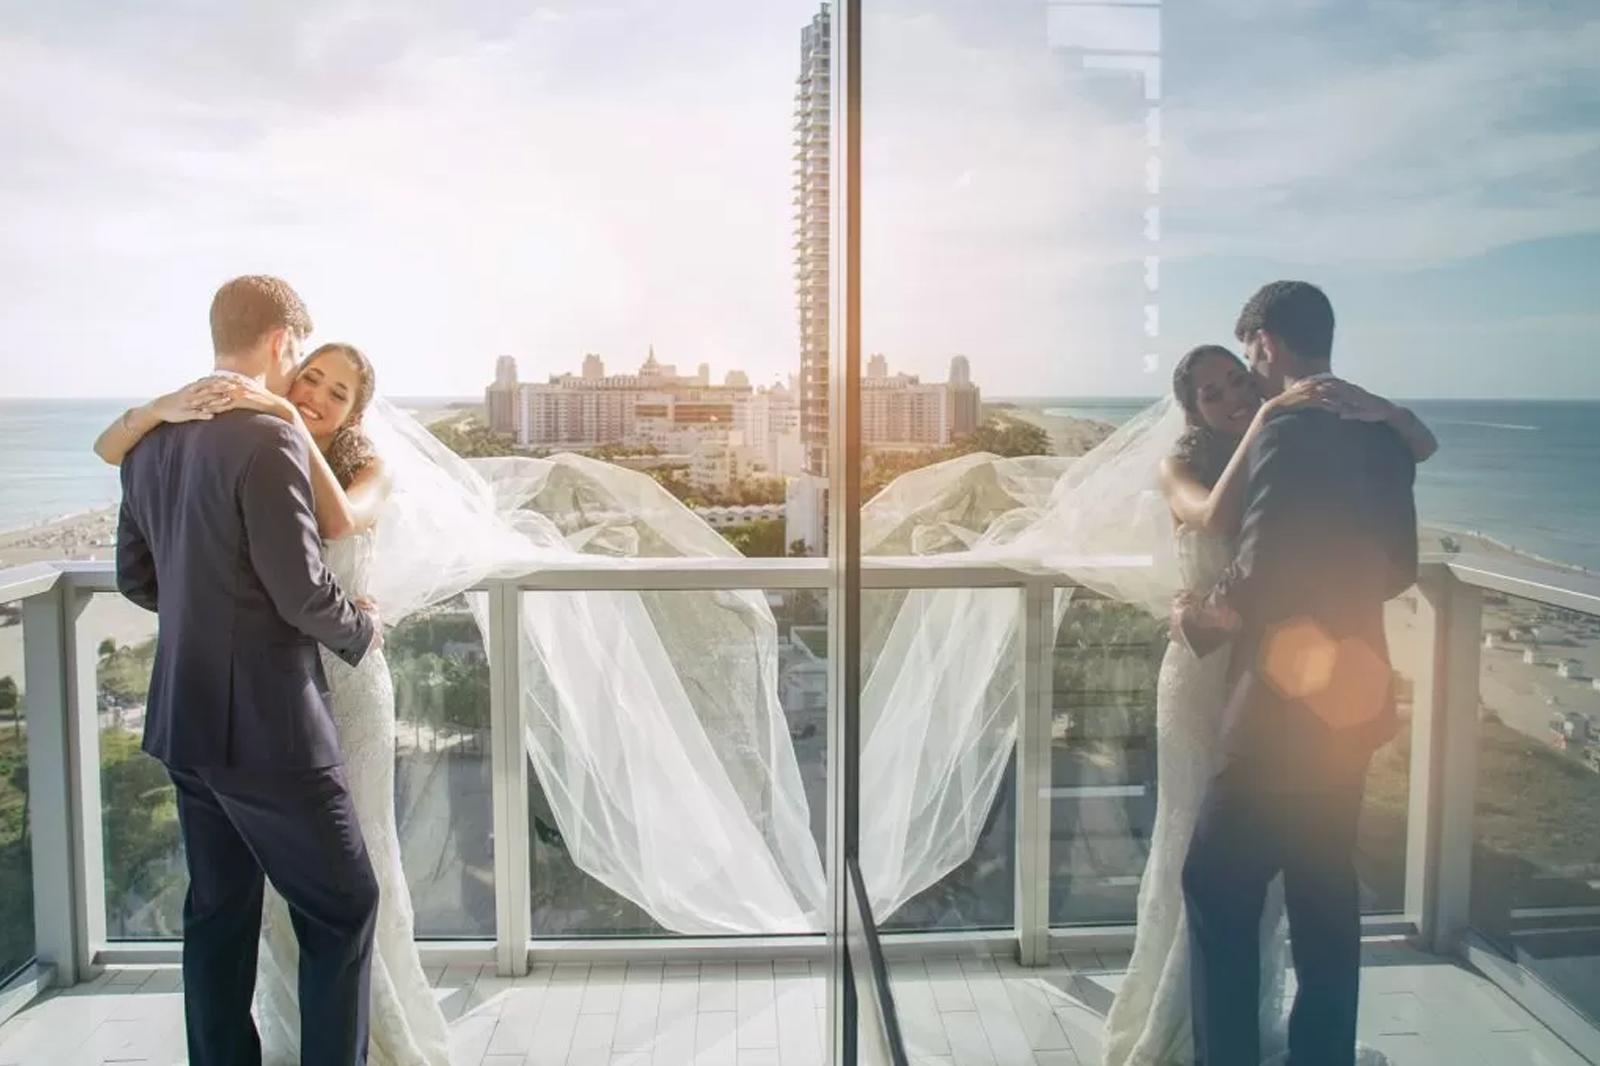 W Hotel Miami Wedding by Domino Arts